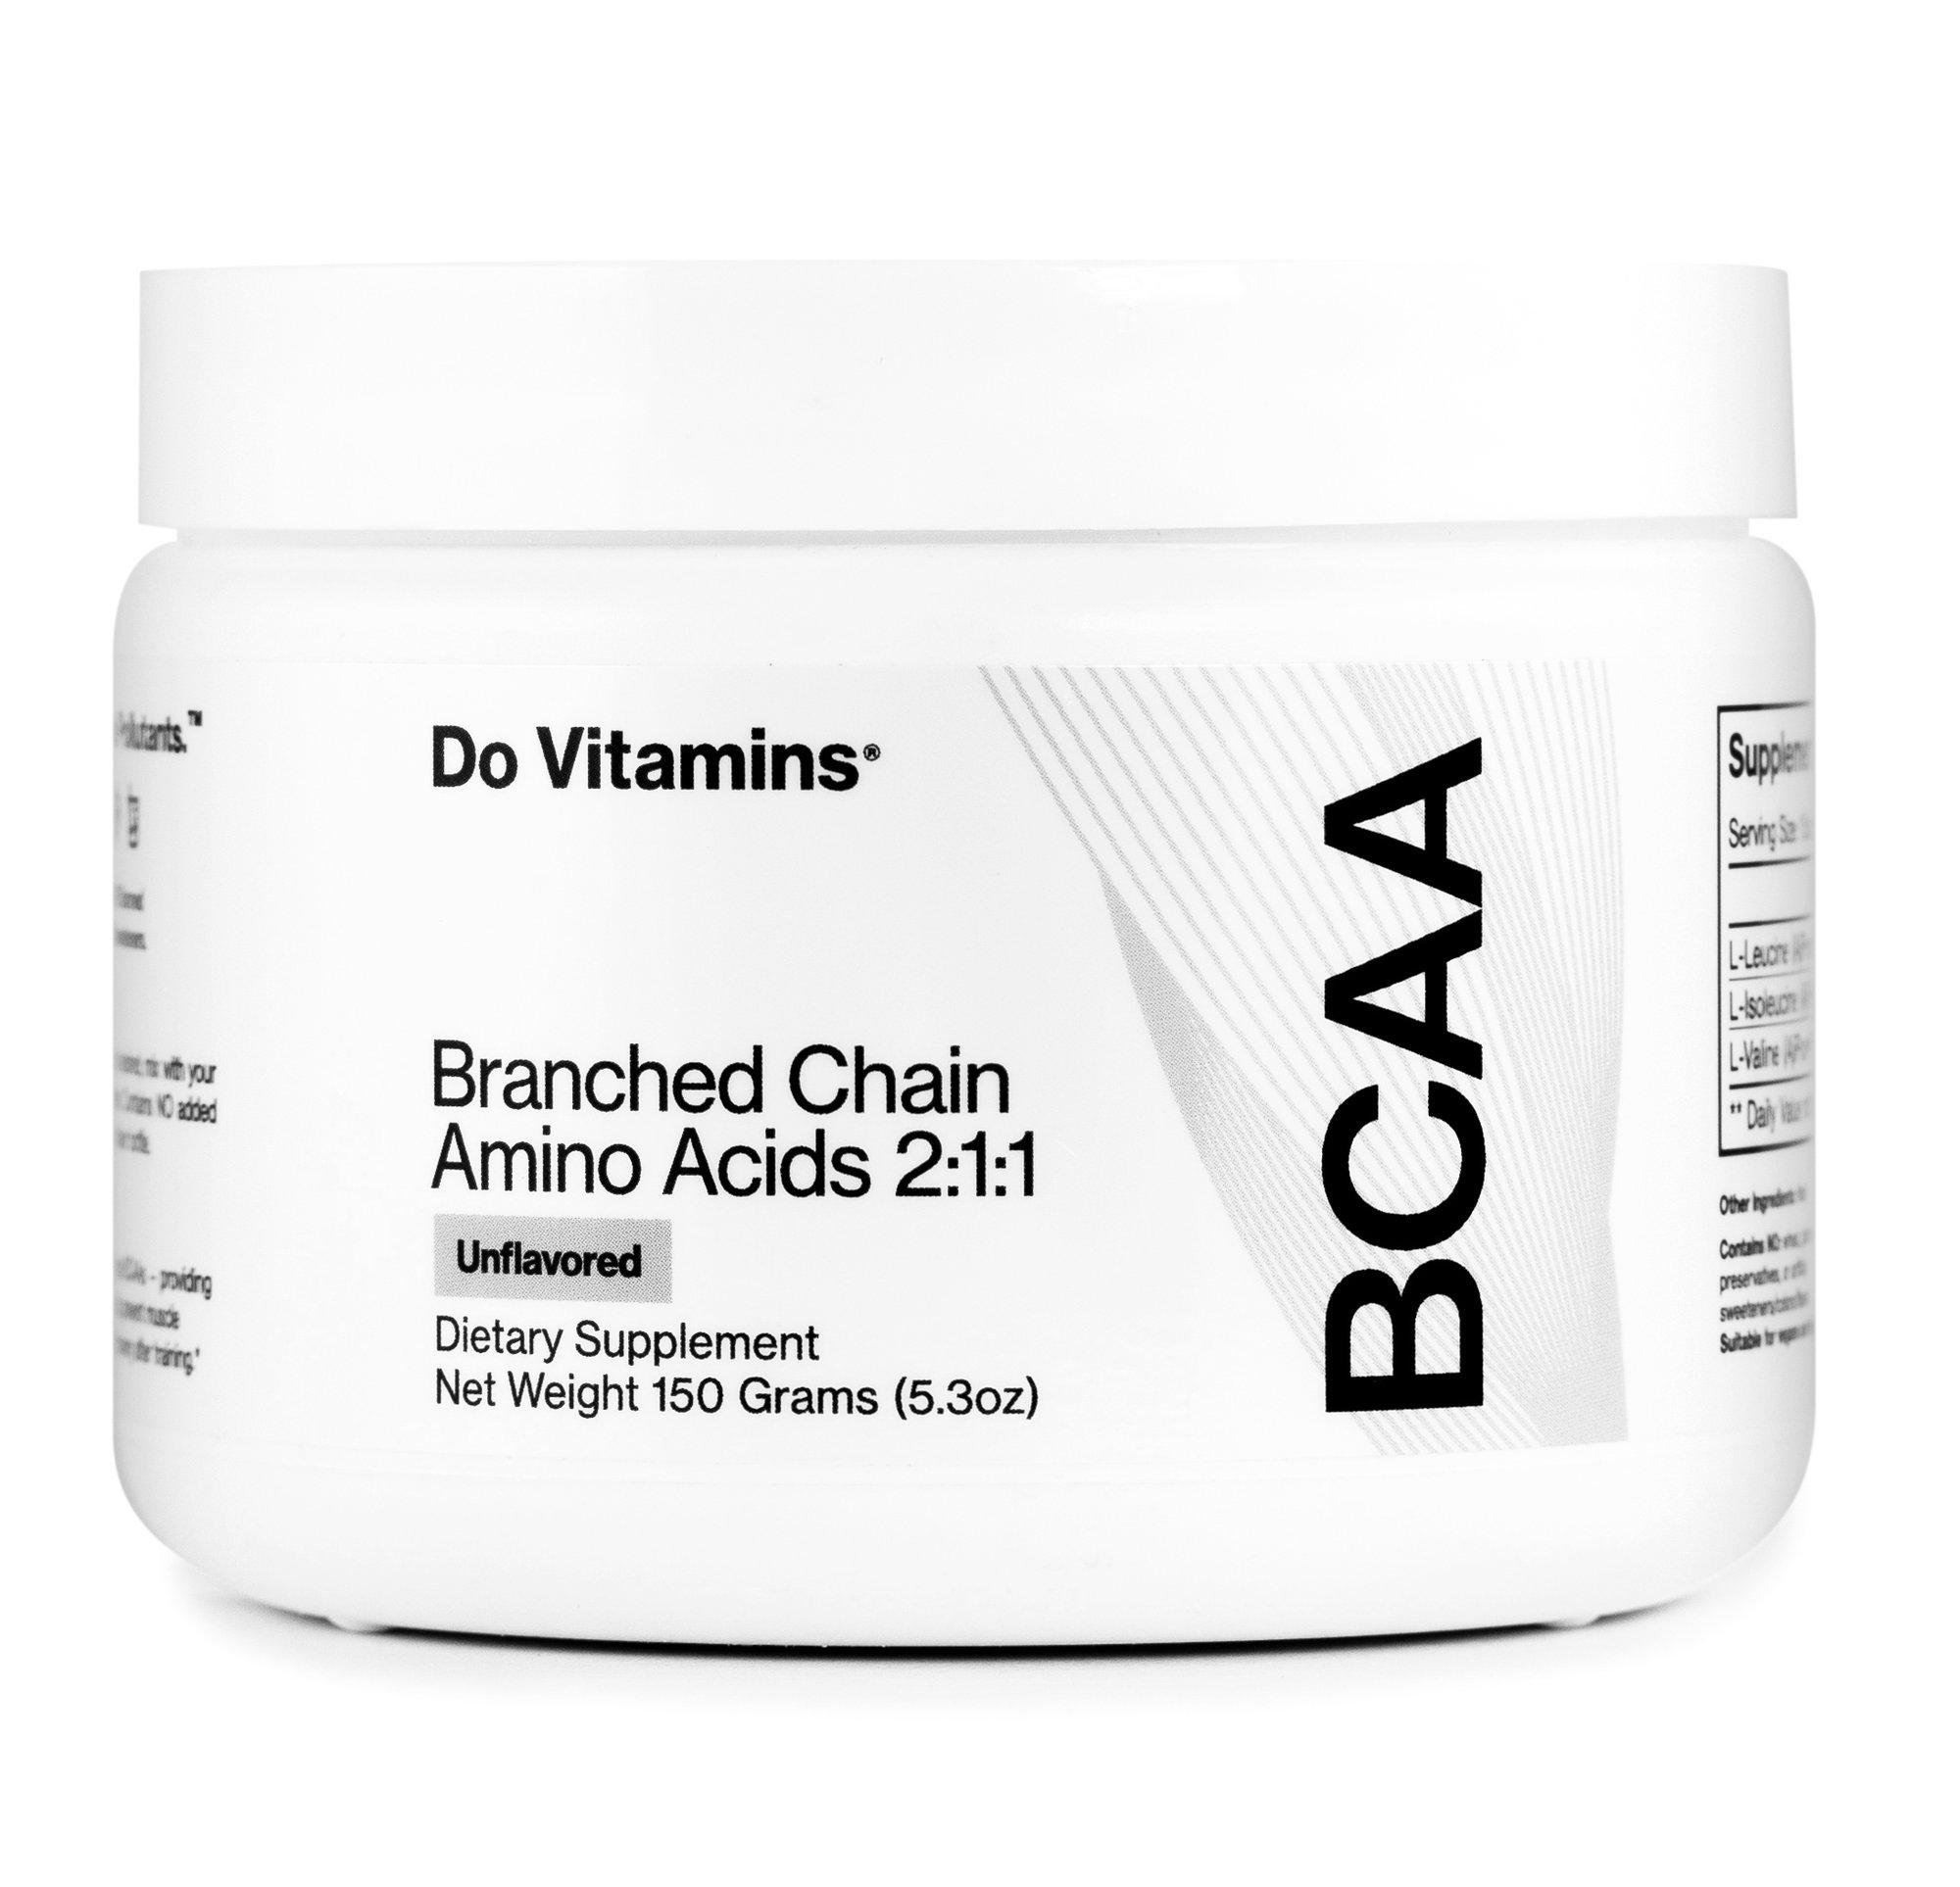 BCAA Powder - Do Vitamins - Certified Paleo, Keto Certified, Paleo Friendly, PaleoVegan by the Paleo Foundation